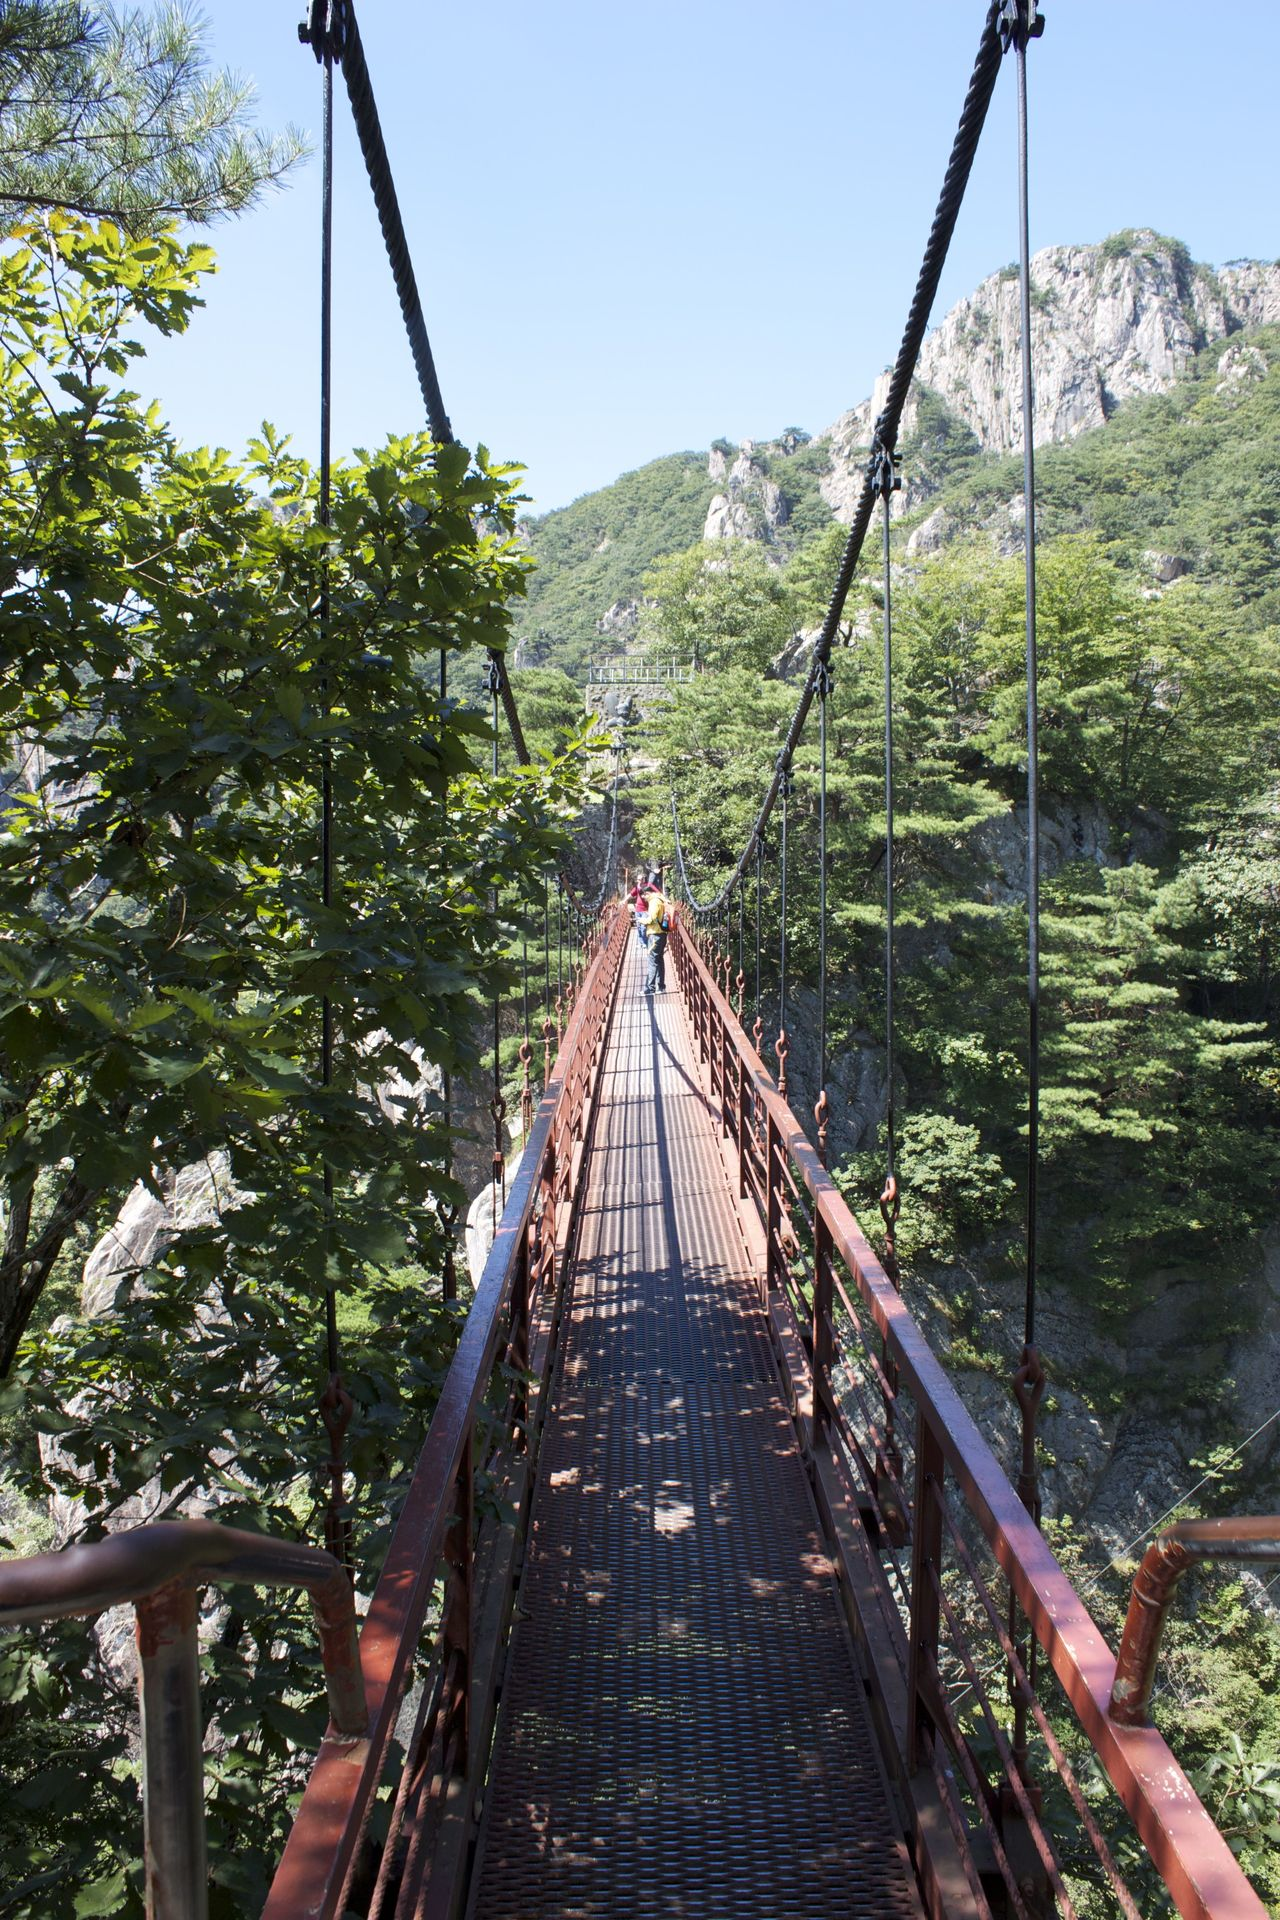 Suspension bridge on Daedun, S. Korea Adventure Beauty In Nature Day Footbridge Forest Green Color Hiking Mountain Nature Outdoors Rope Bridge Scenics Suspension Bridge The Way Forward Travel Tree